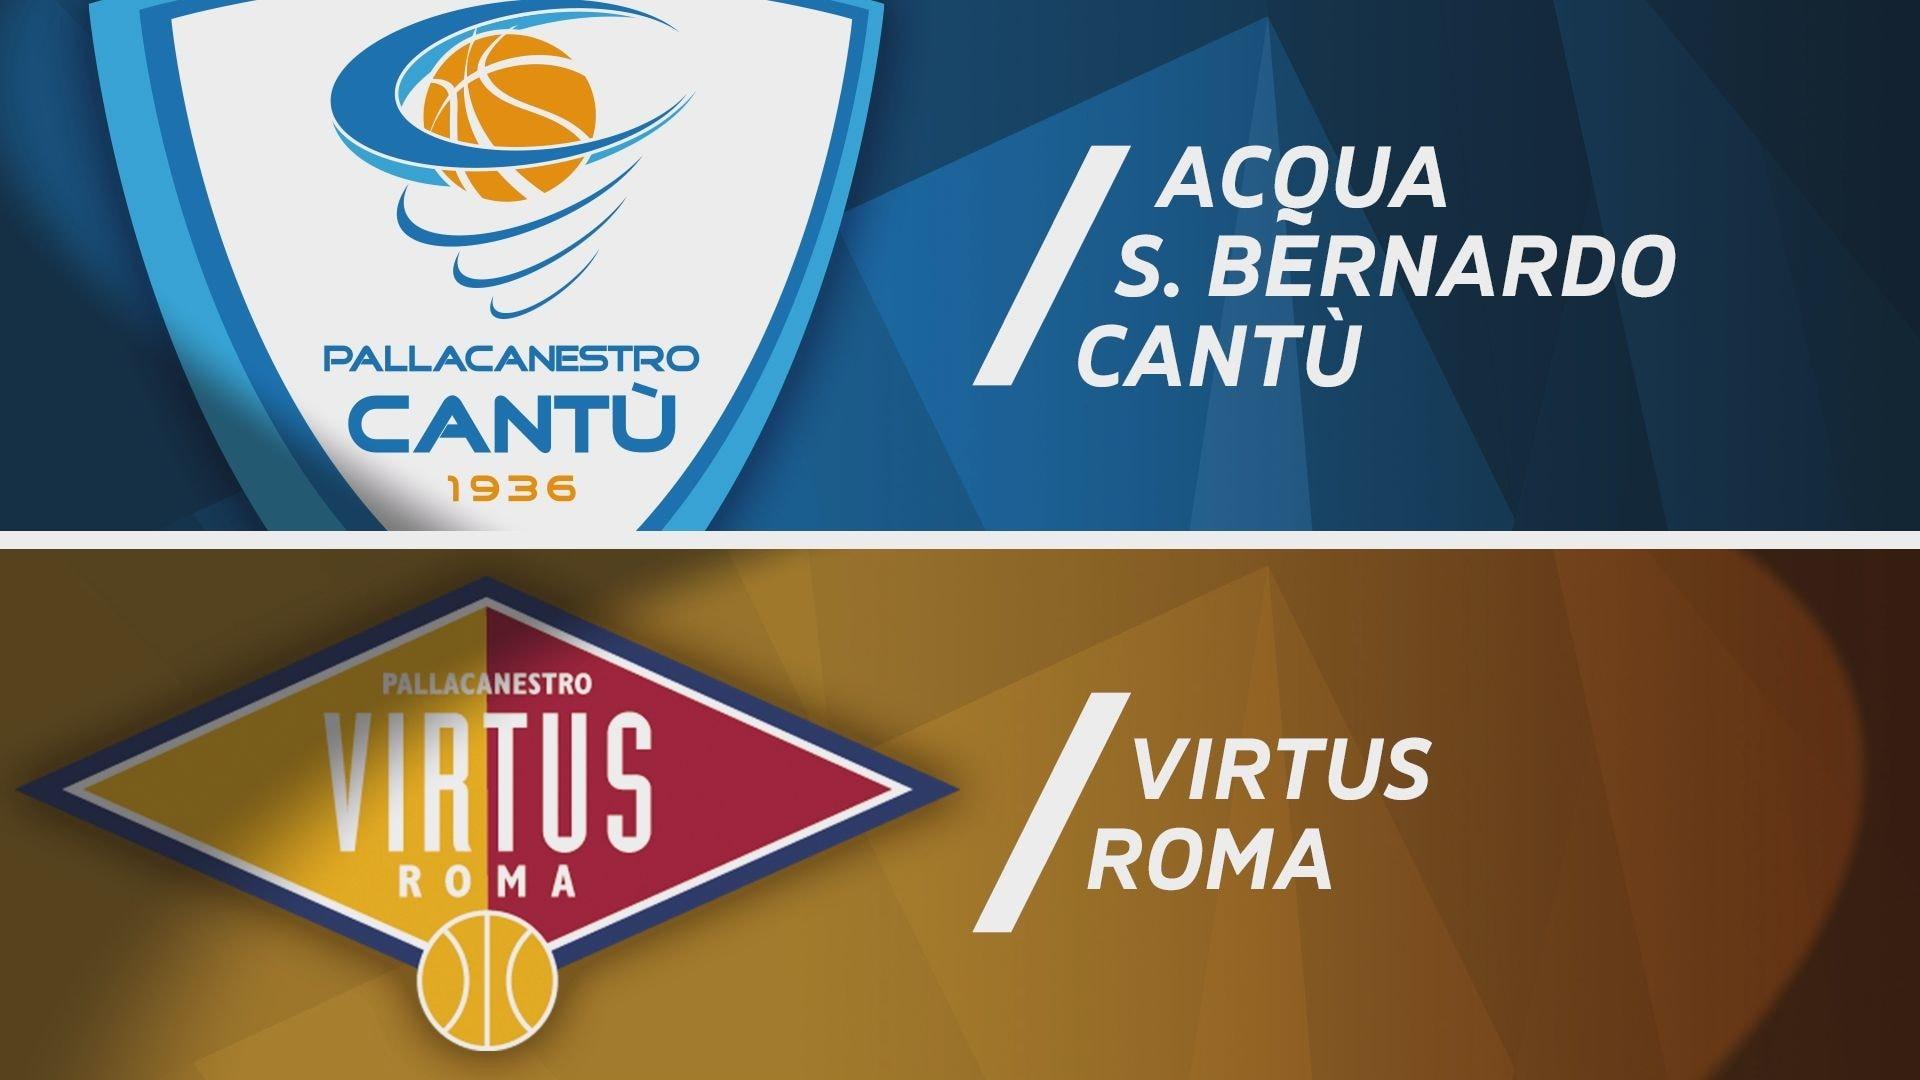 Acqua S.Bernardo Cantù - Virtus Roma 101-85